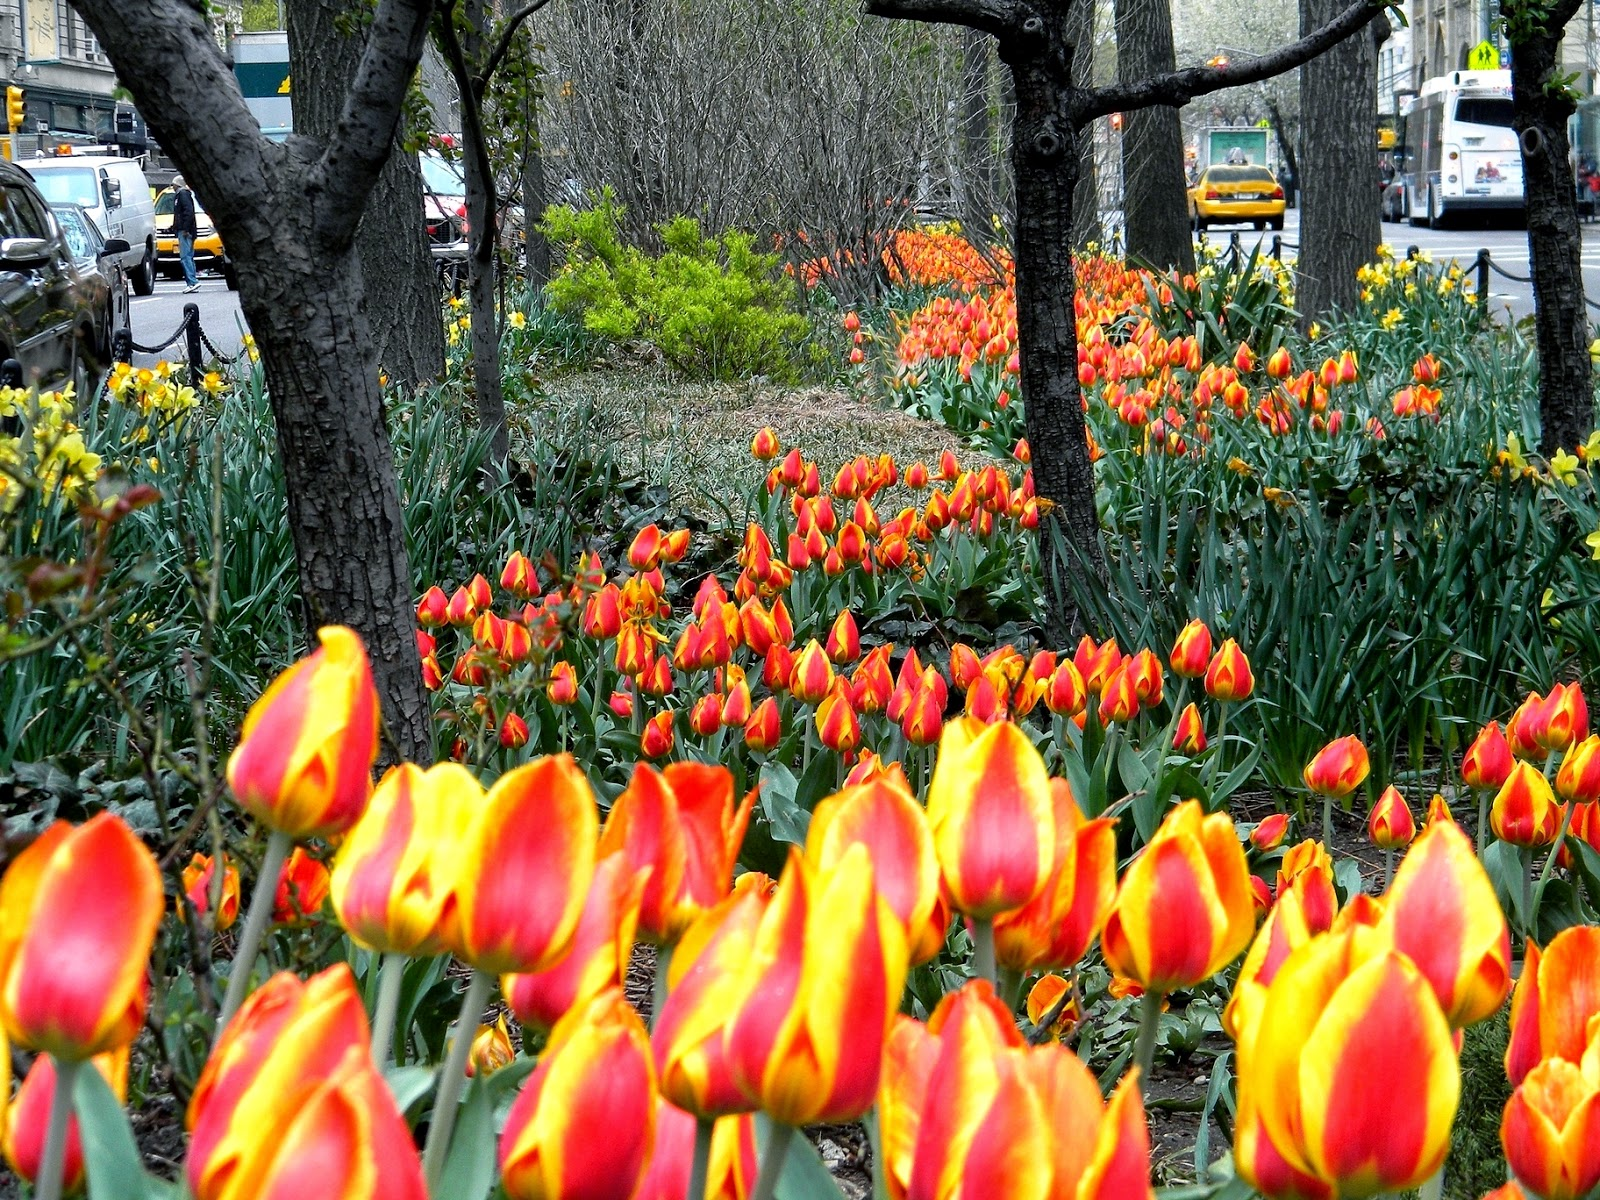 Spring Flowers New York City Clip Art Public Domain Clip Art s and